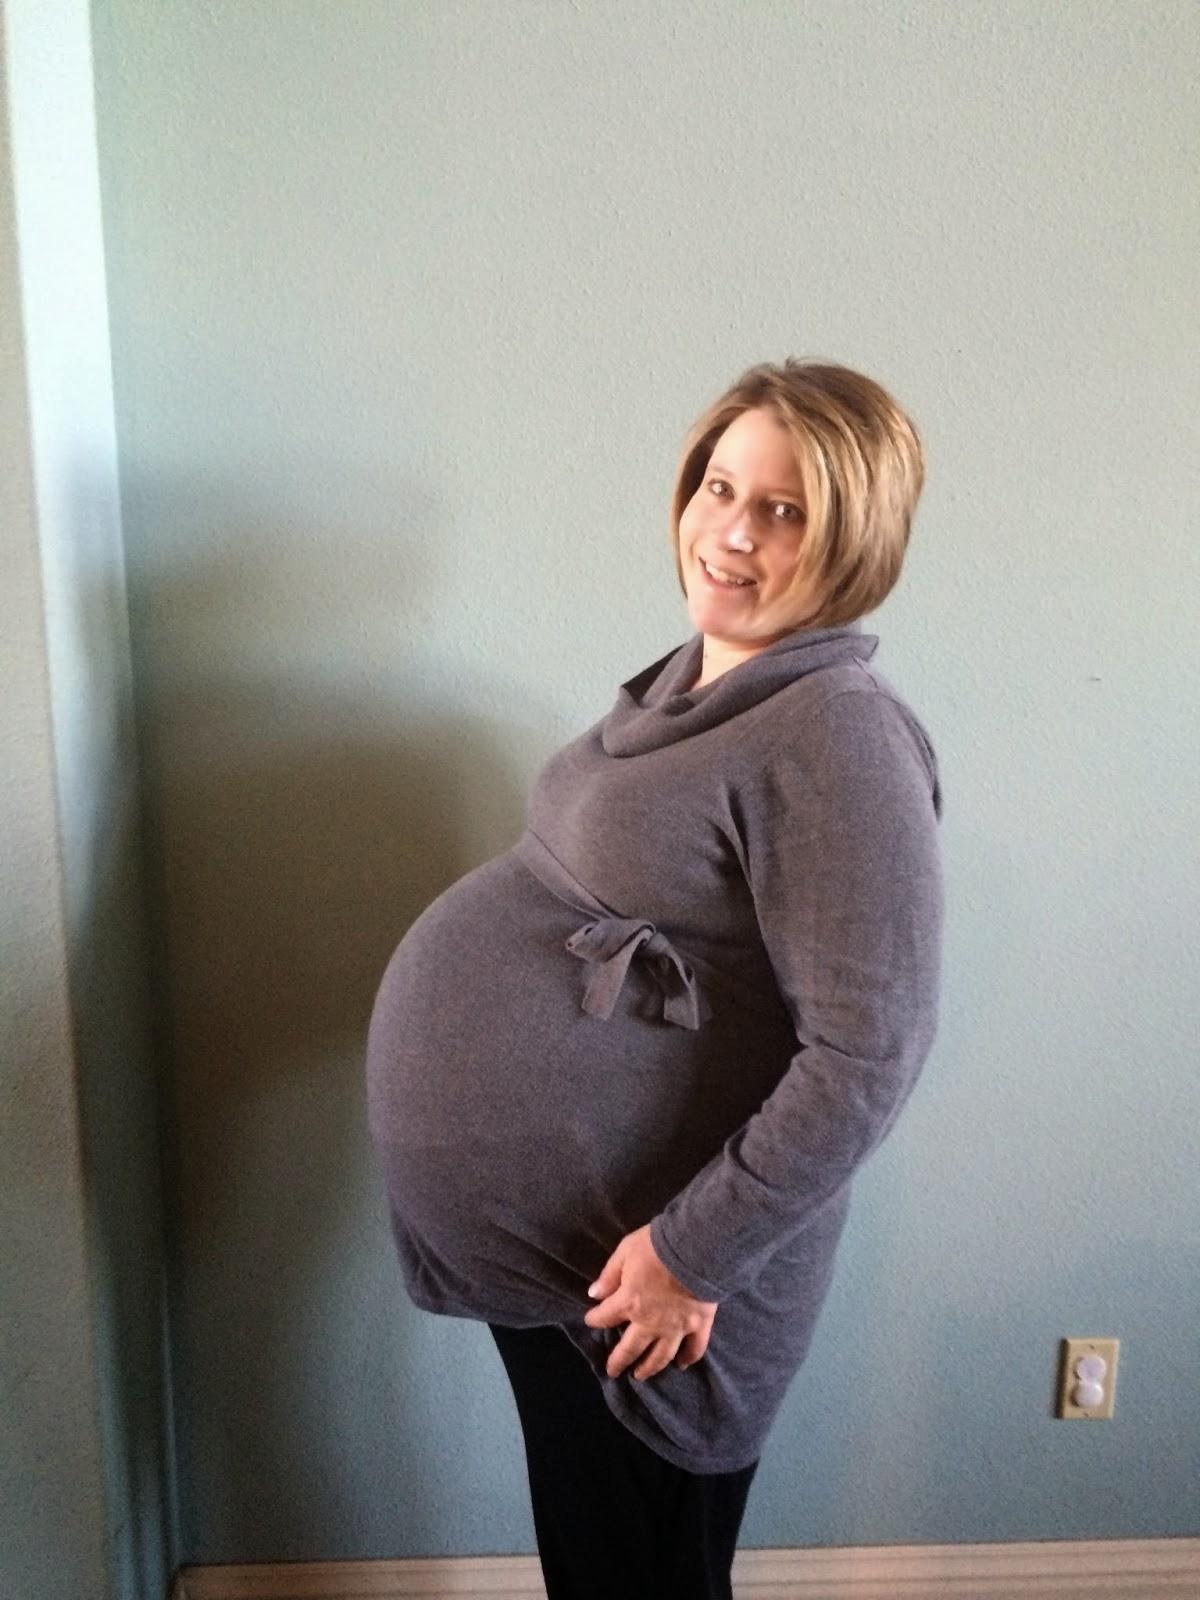 34 weeks pregnant twins pregnancy photos birth